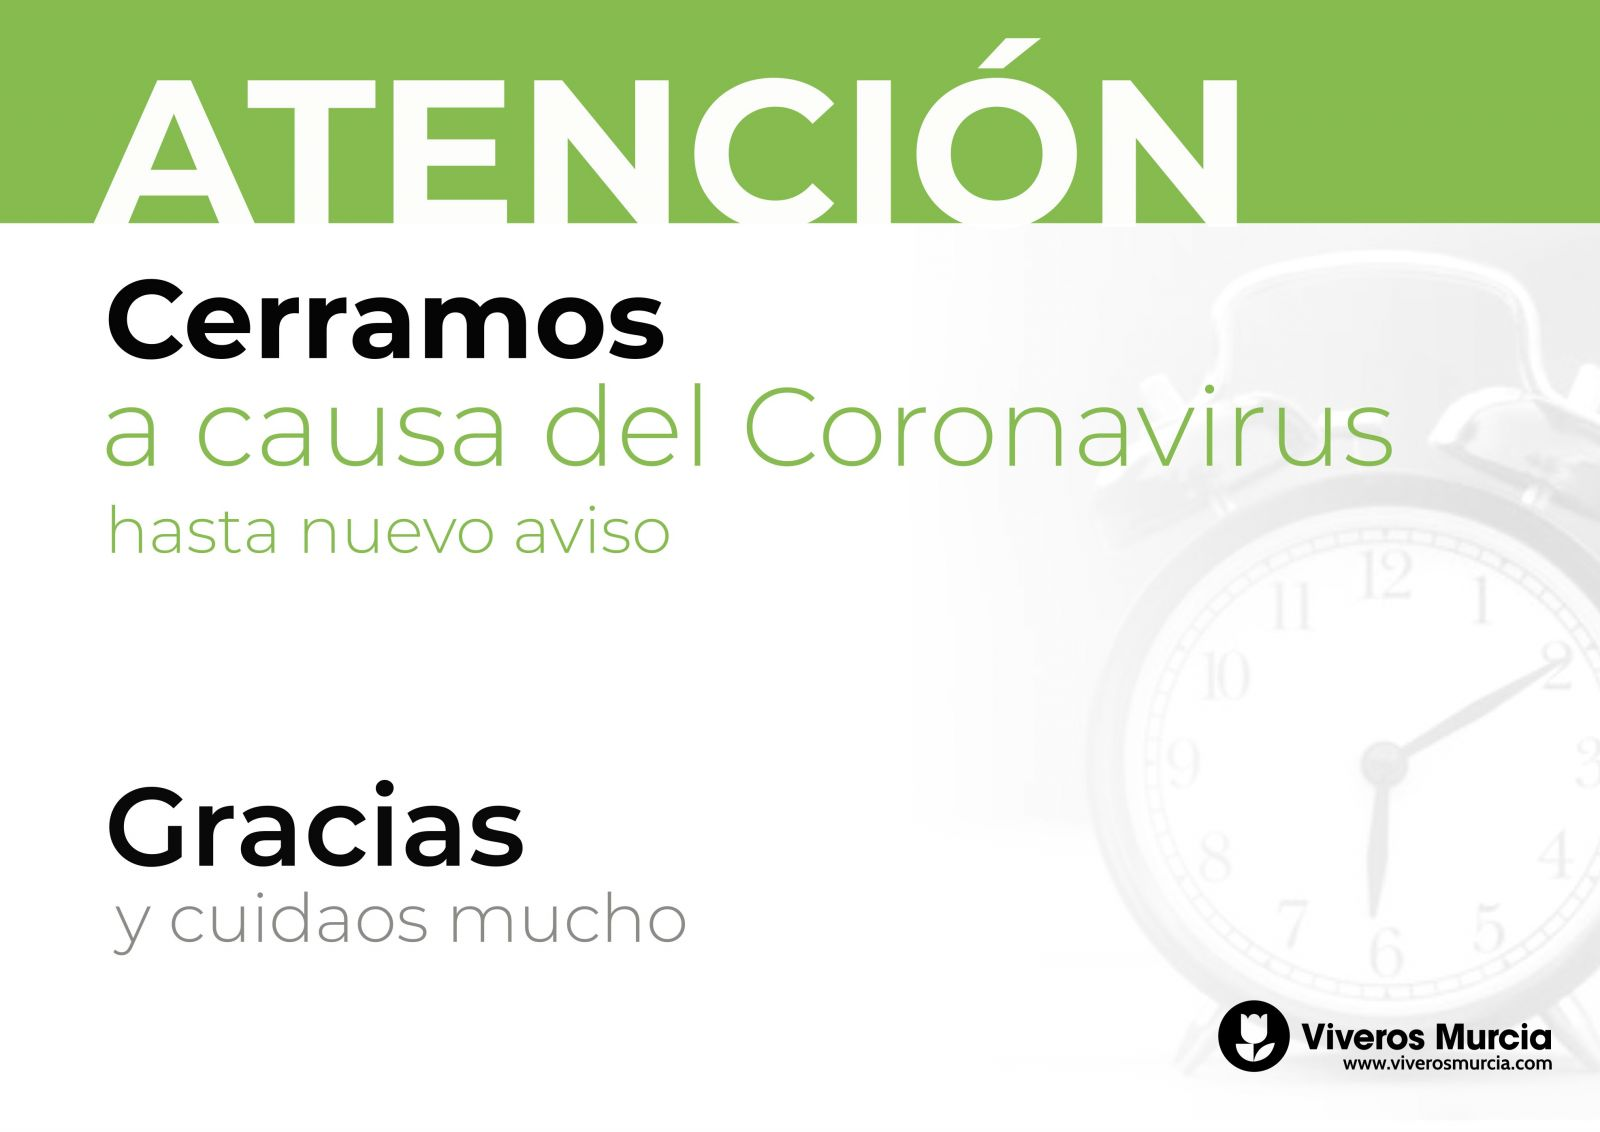 Cierre temporal a causa del Coronavirus